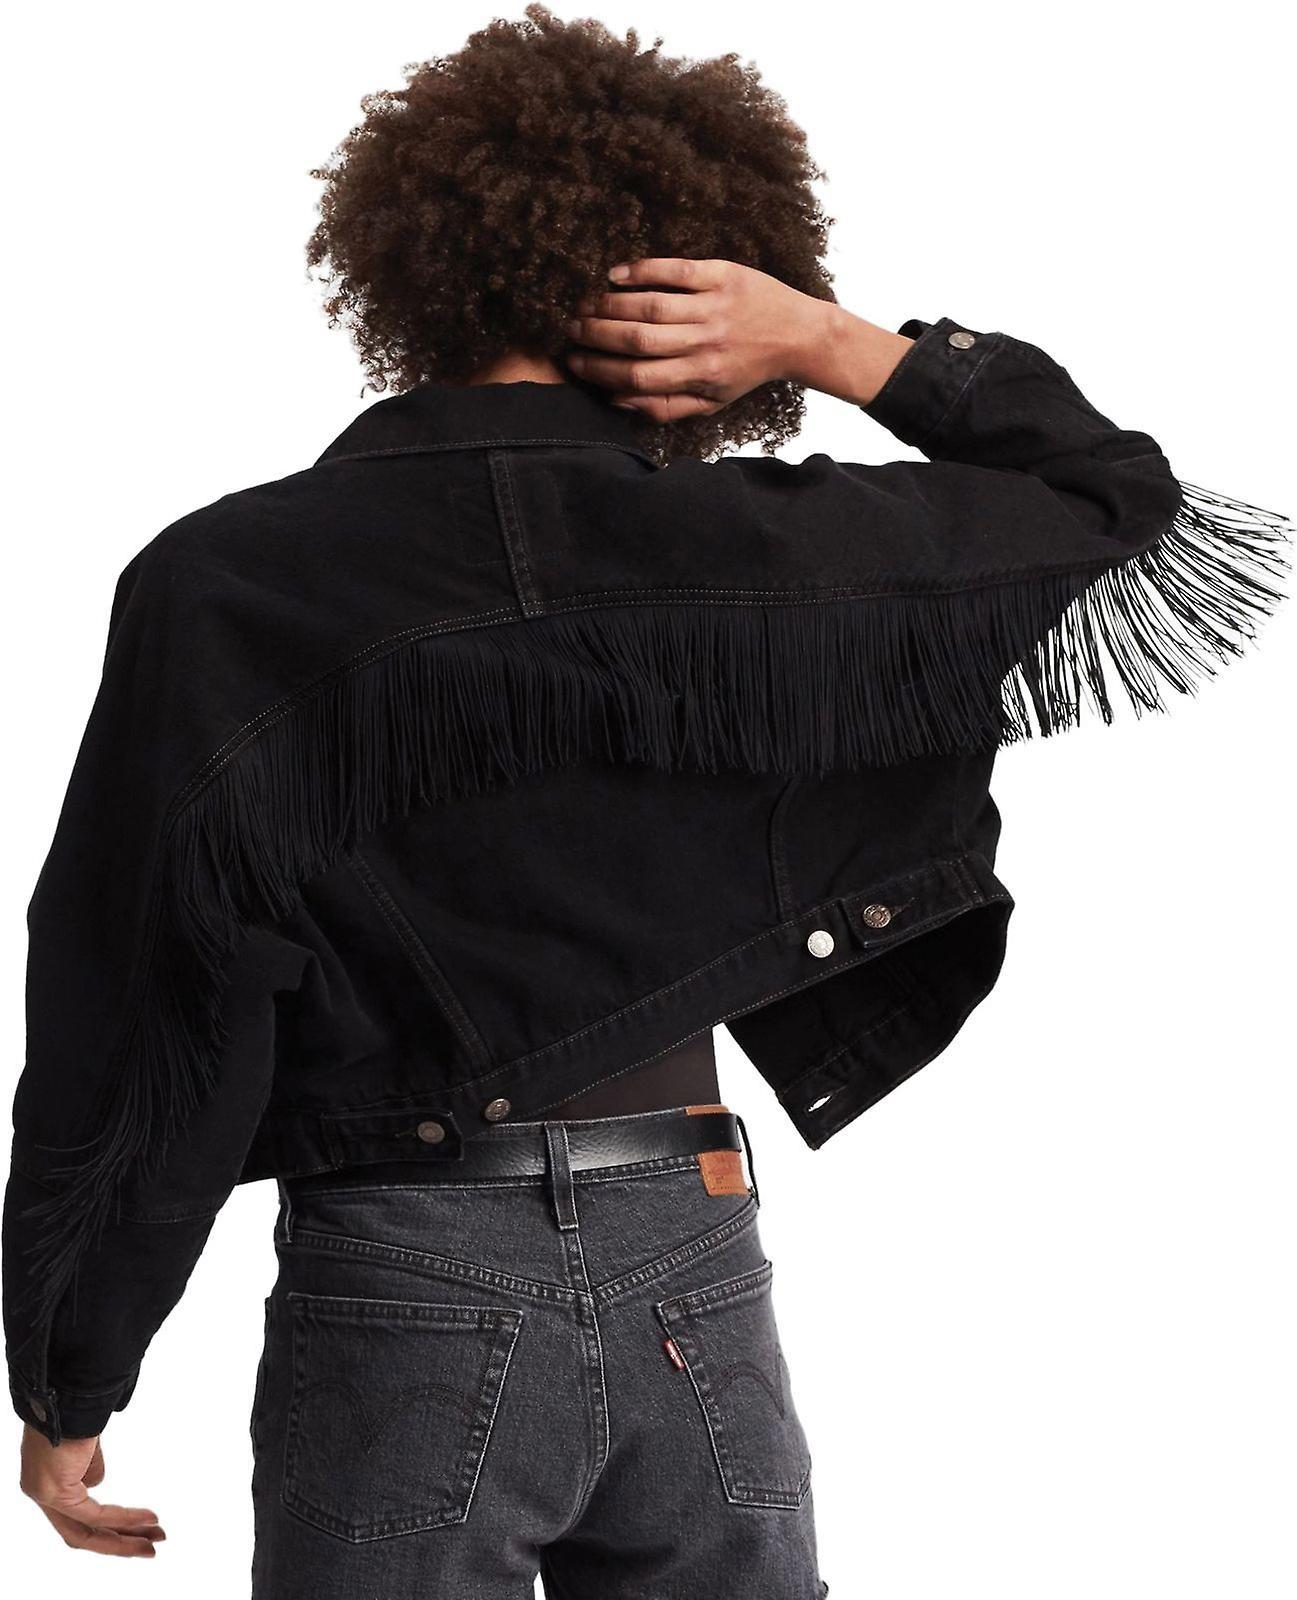 Levi's Fringe Trucker Denim Jacket